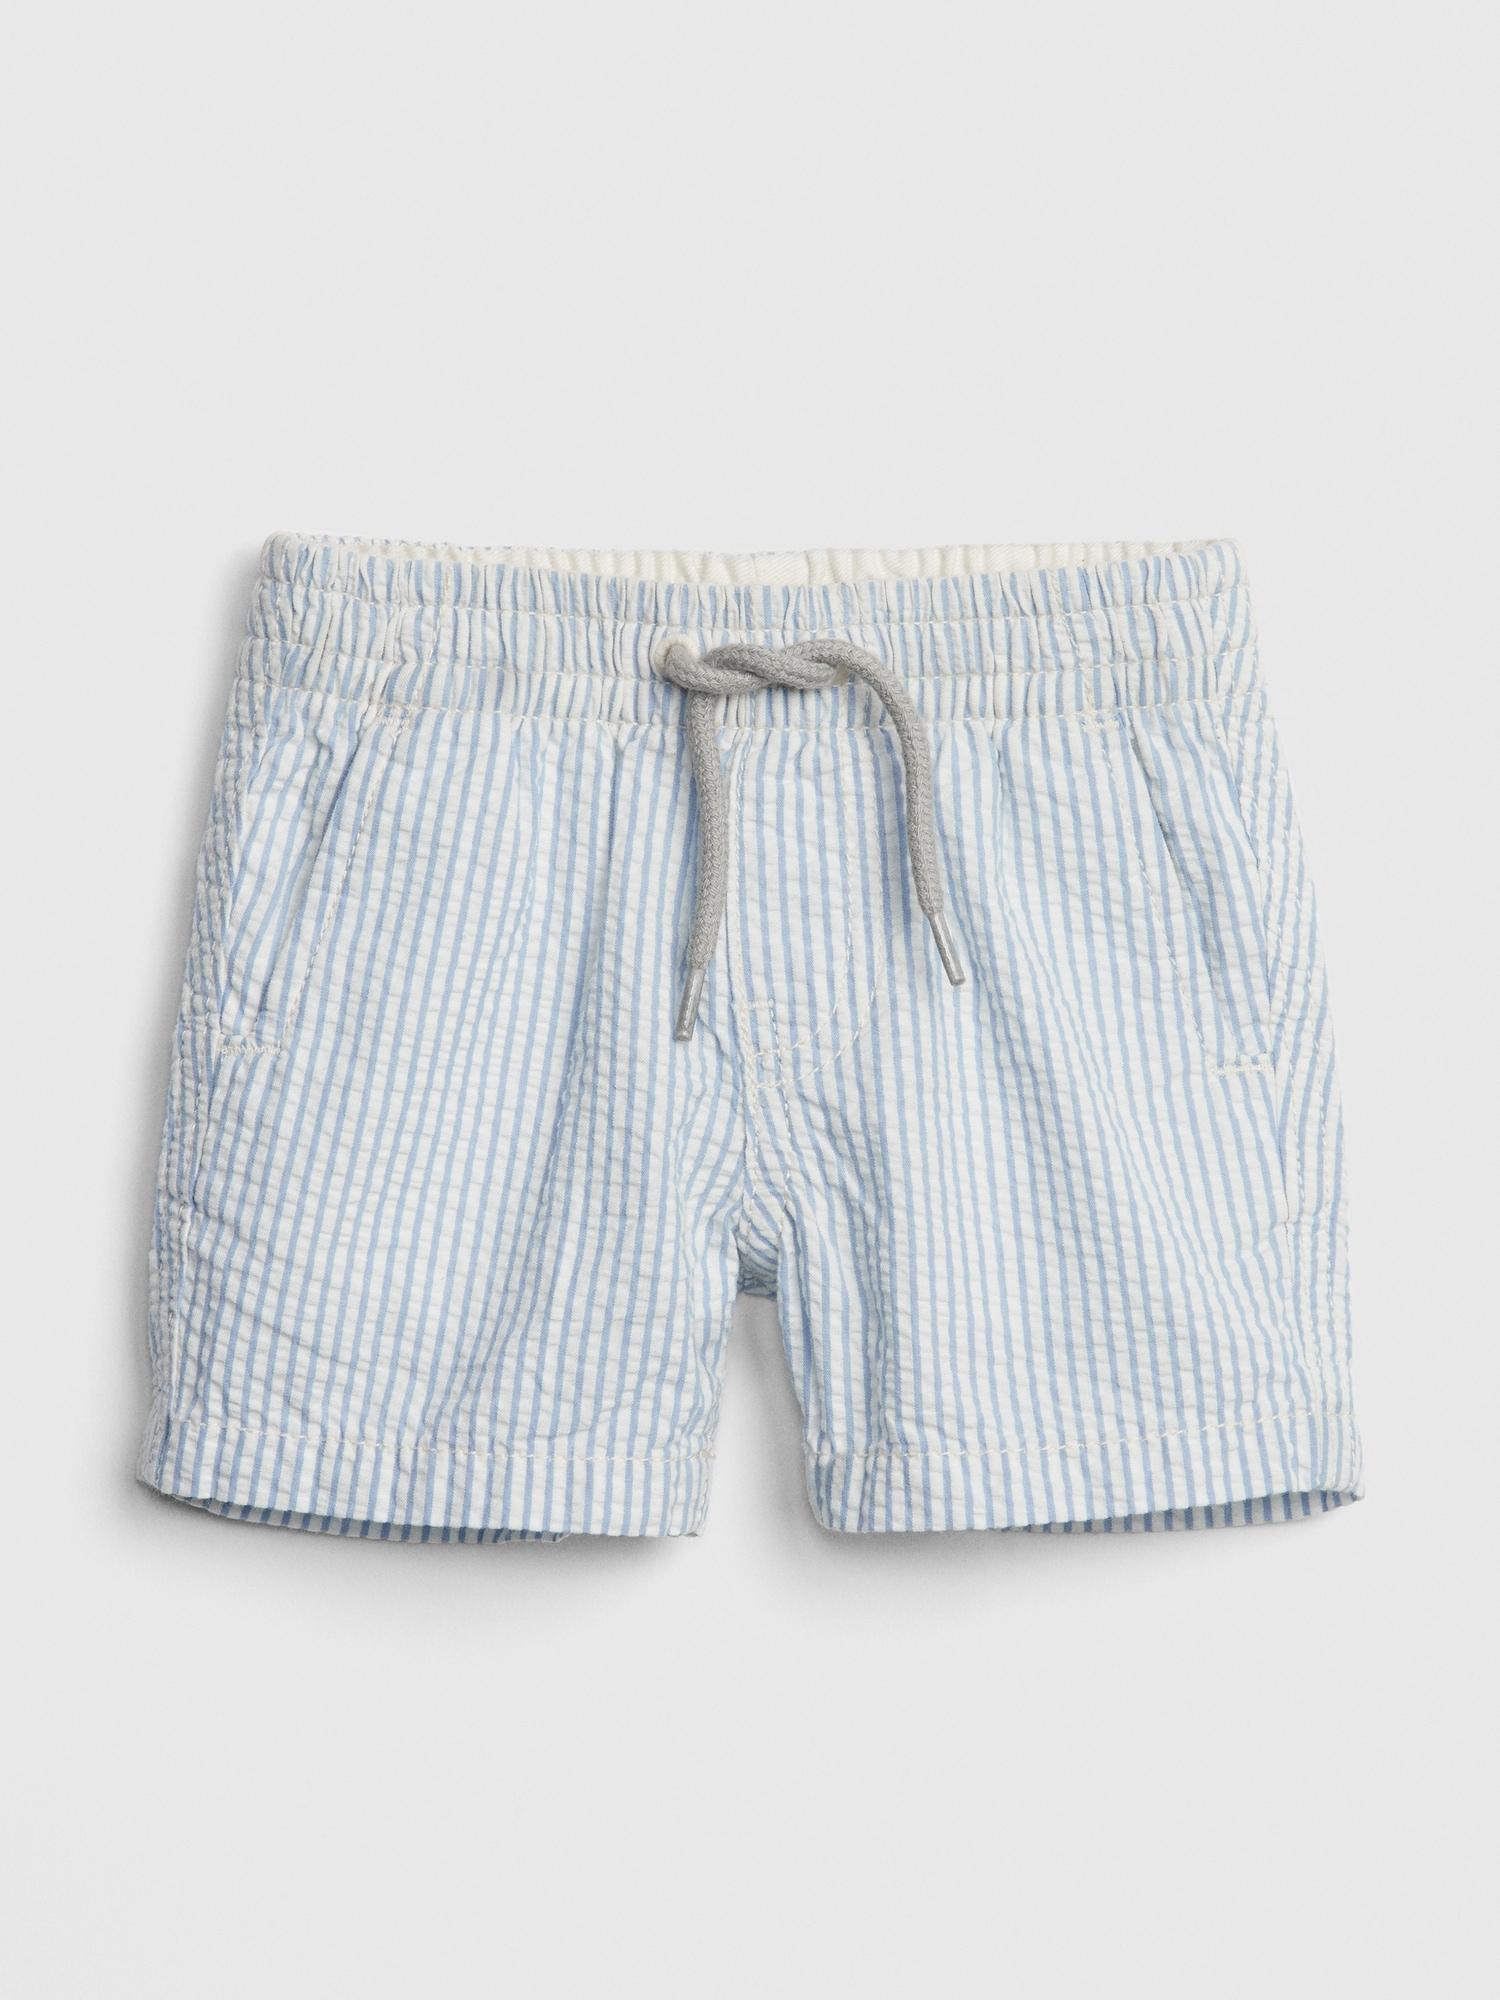 79802940c4 Baby Seersucker Pull-On Shorts | Gap